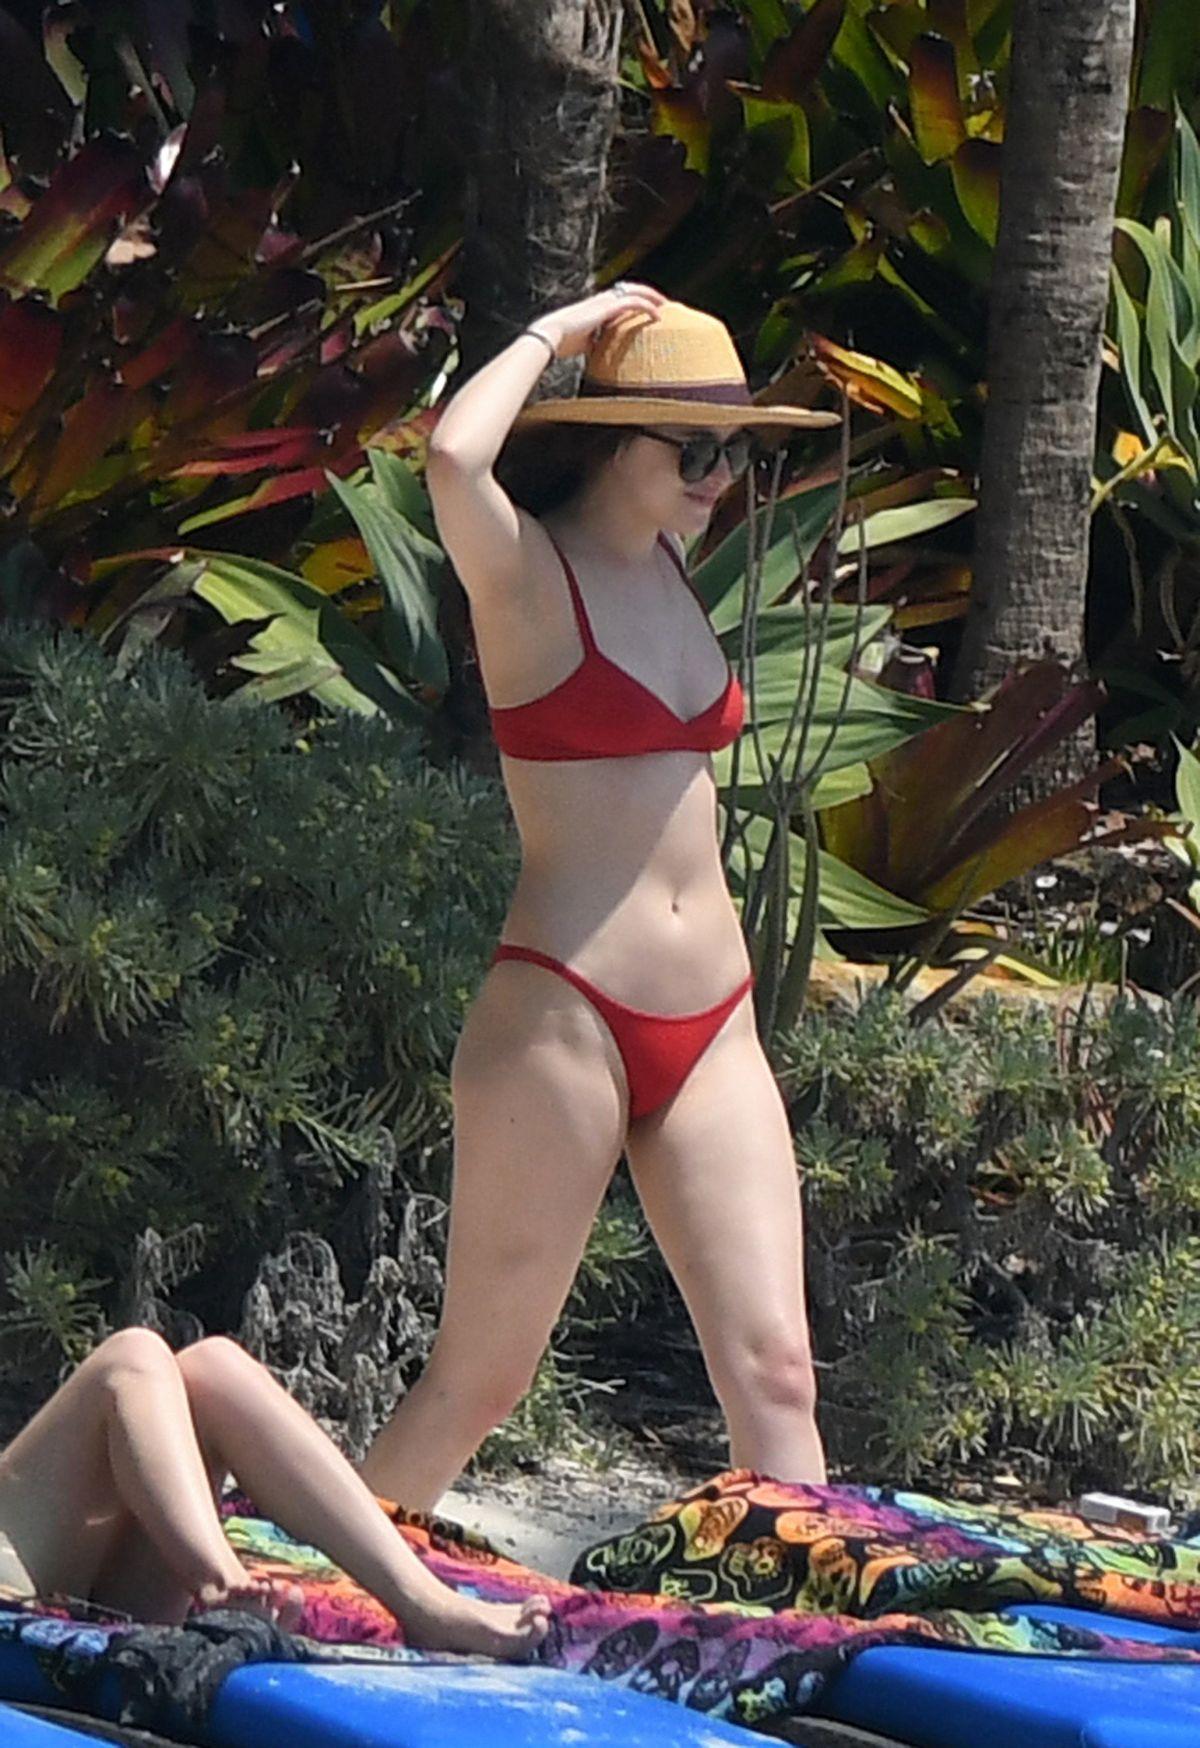 DAKOTA JOHNSON in Red Bikini at a Beach in Miami 03/31/2017